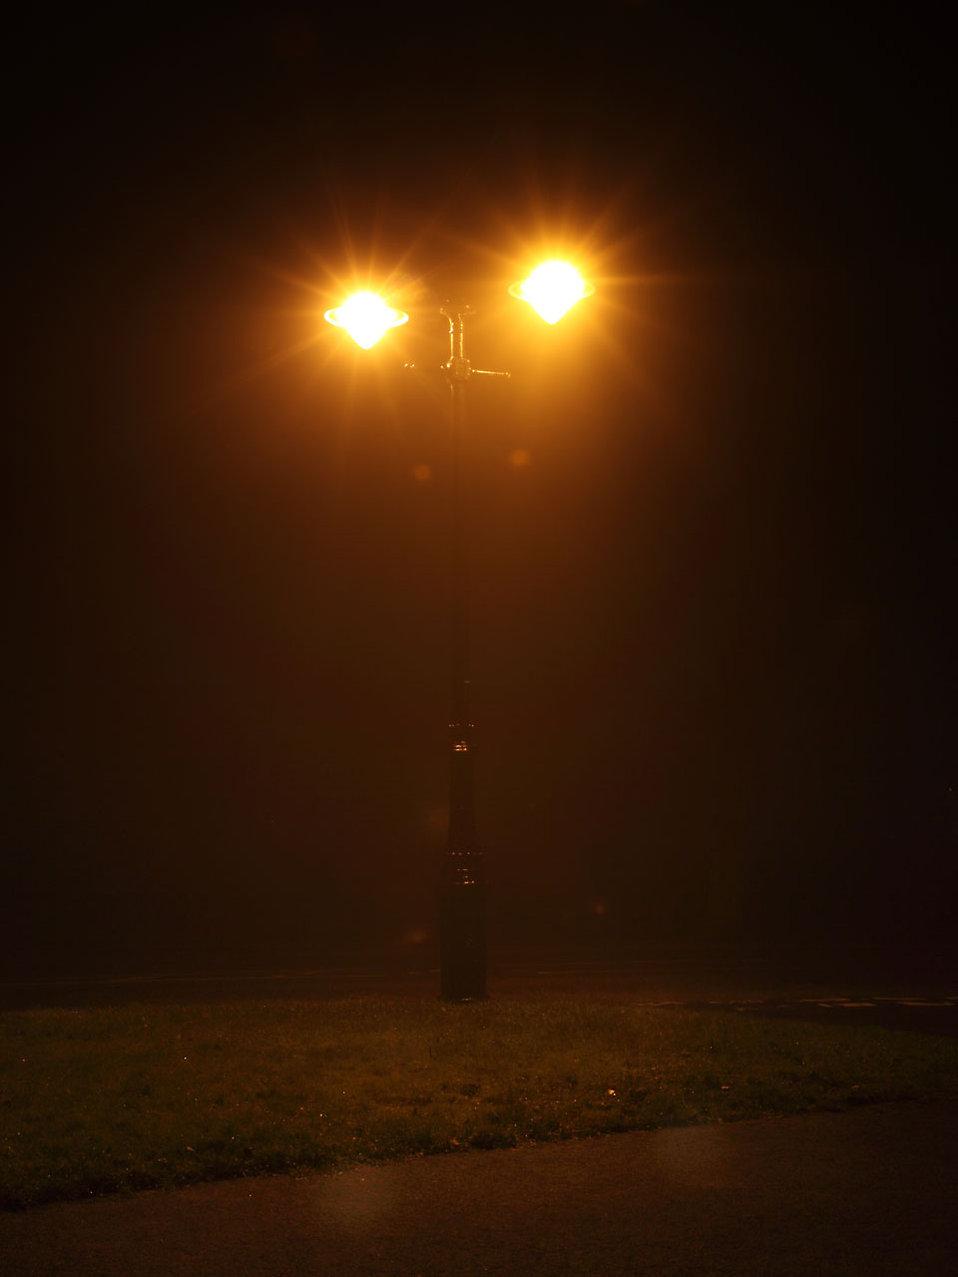 Street Lamp Free Stock Photo A Street Lamp Shining On